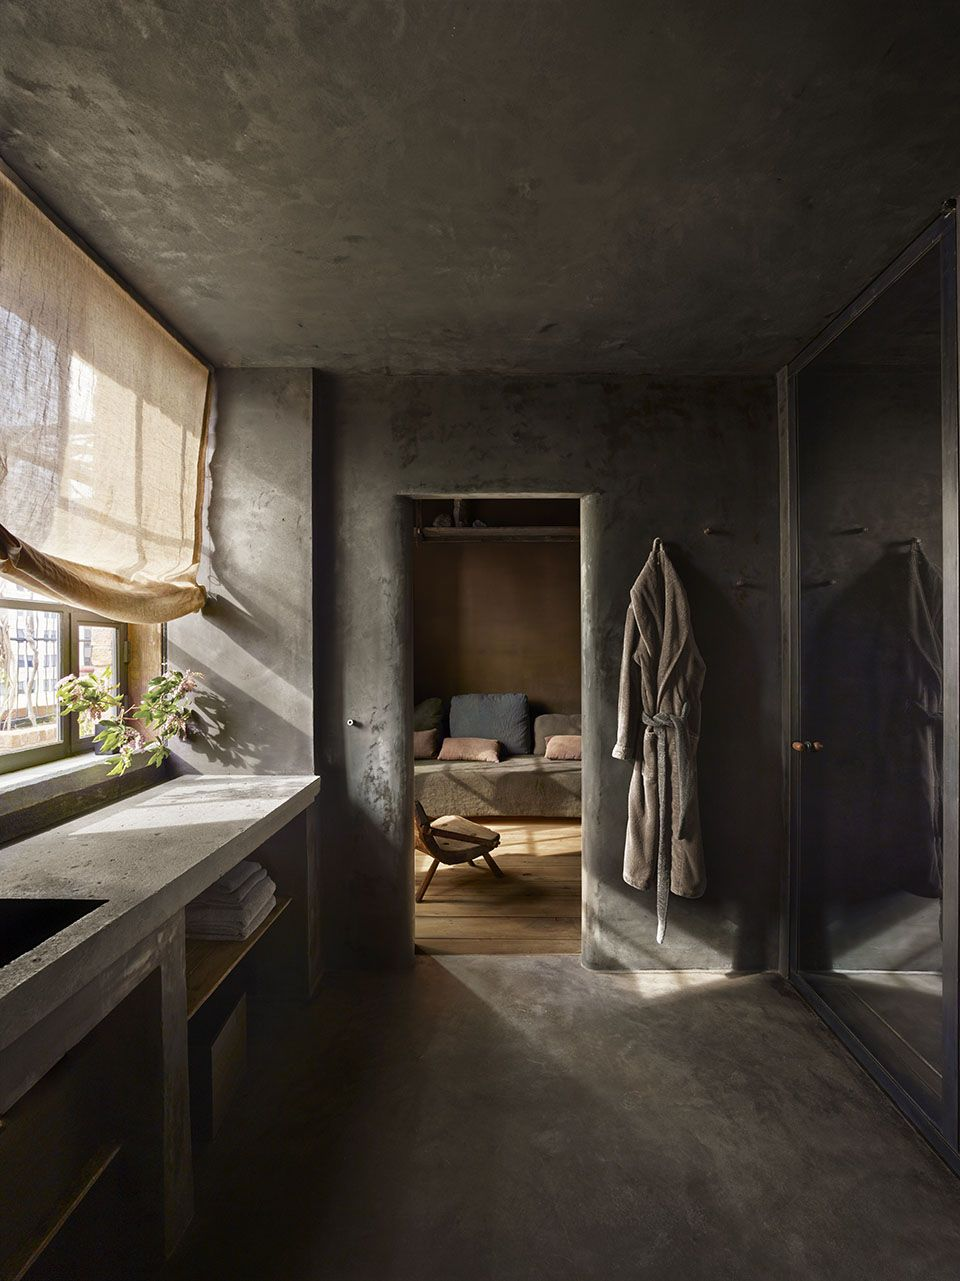 Esprit wabi-sabi | Wabi sabi, Villa design and Bathroom designs